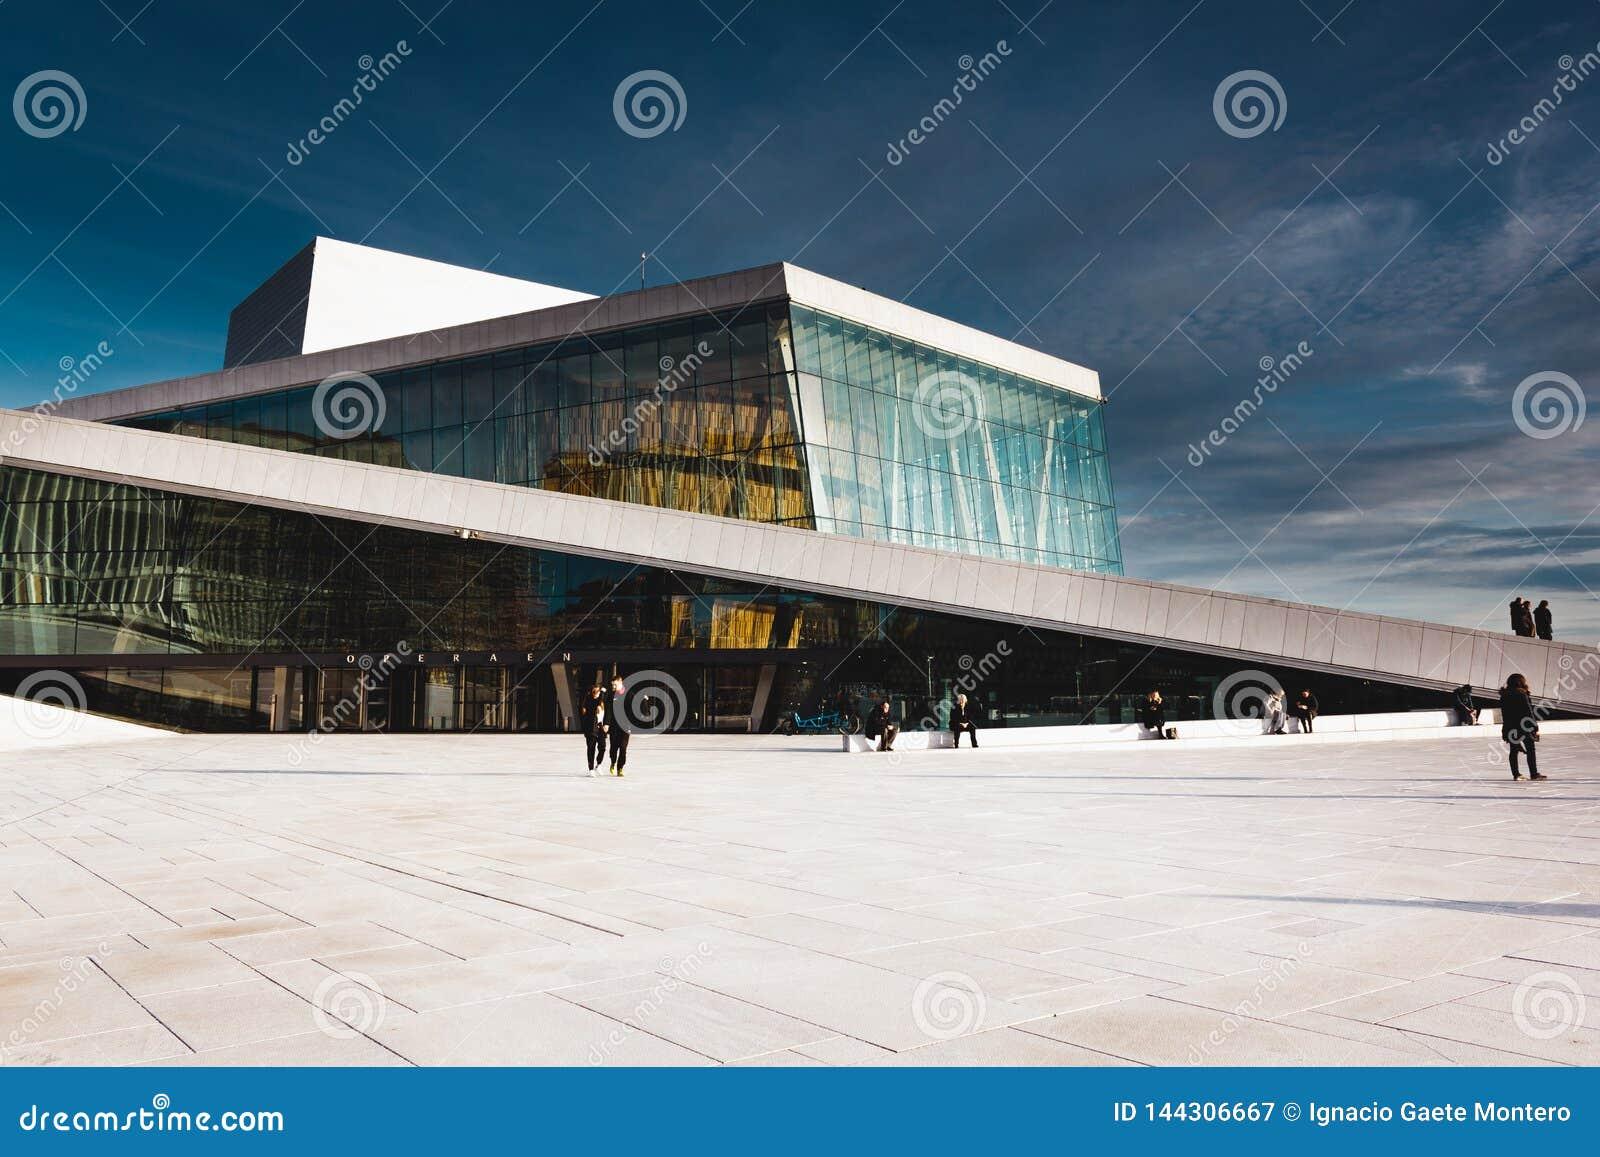 The Oslo Opera House, Operahuset